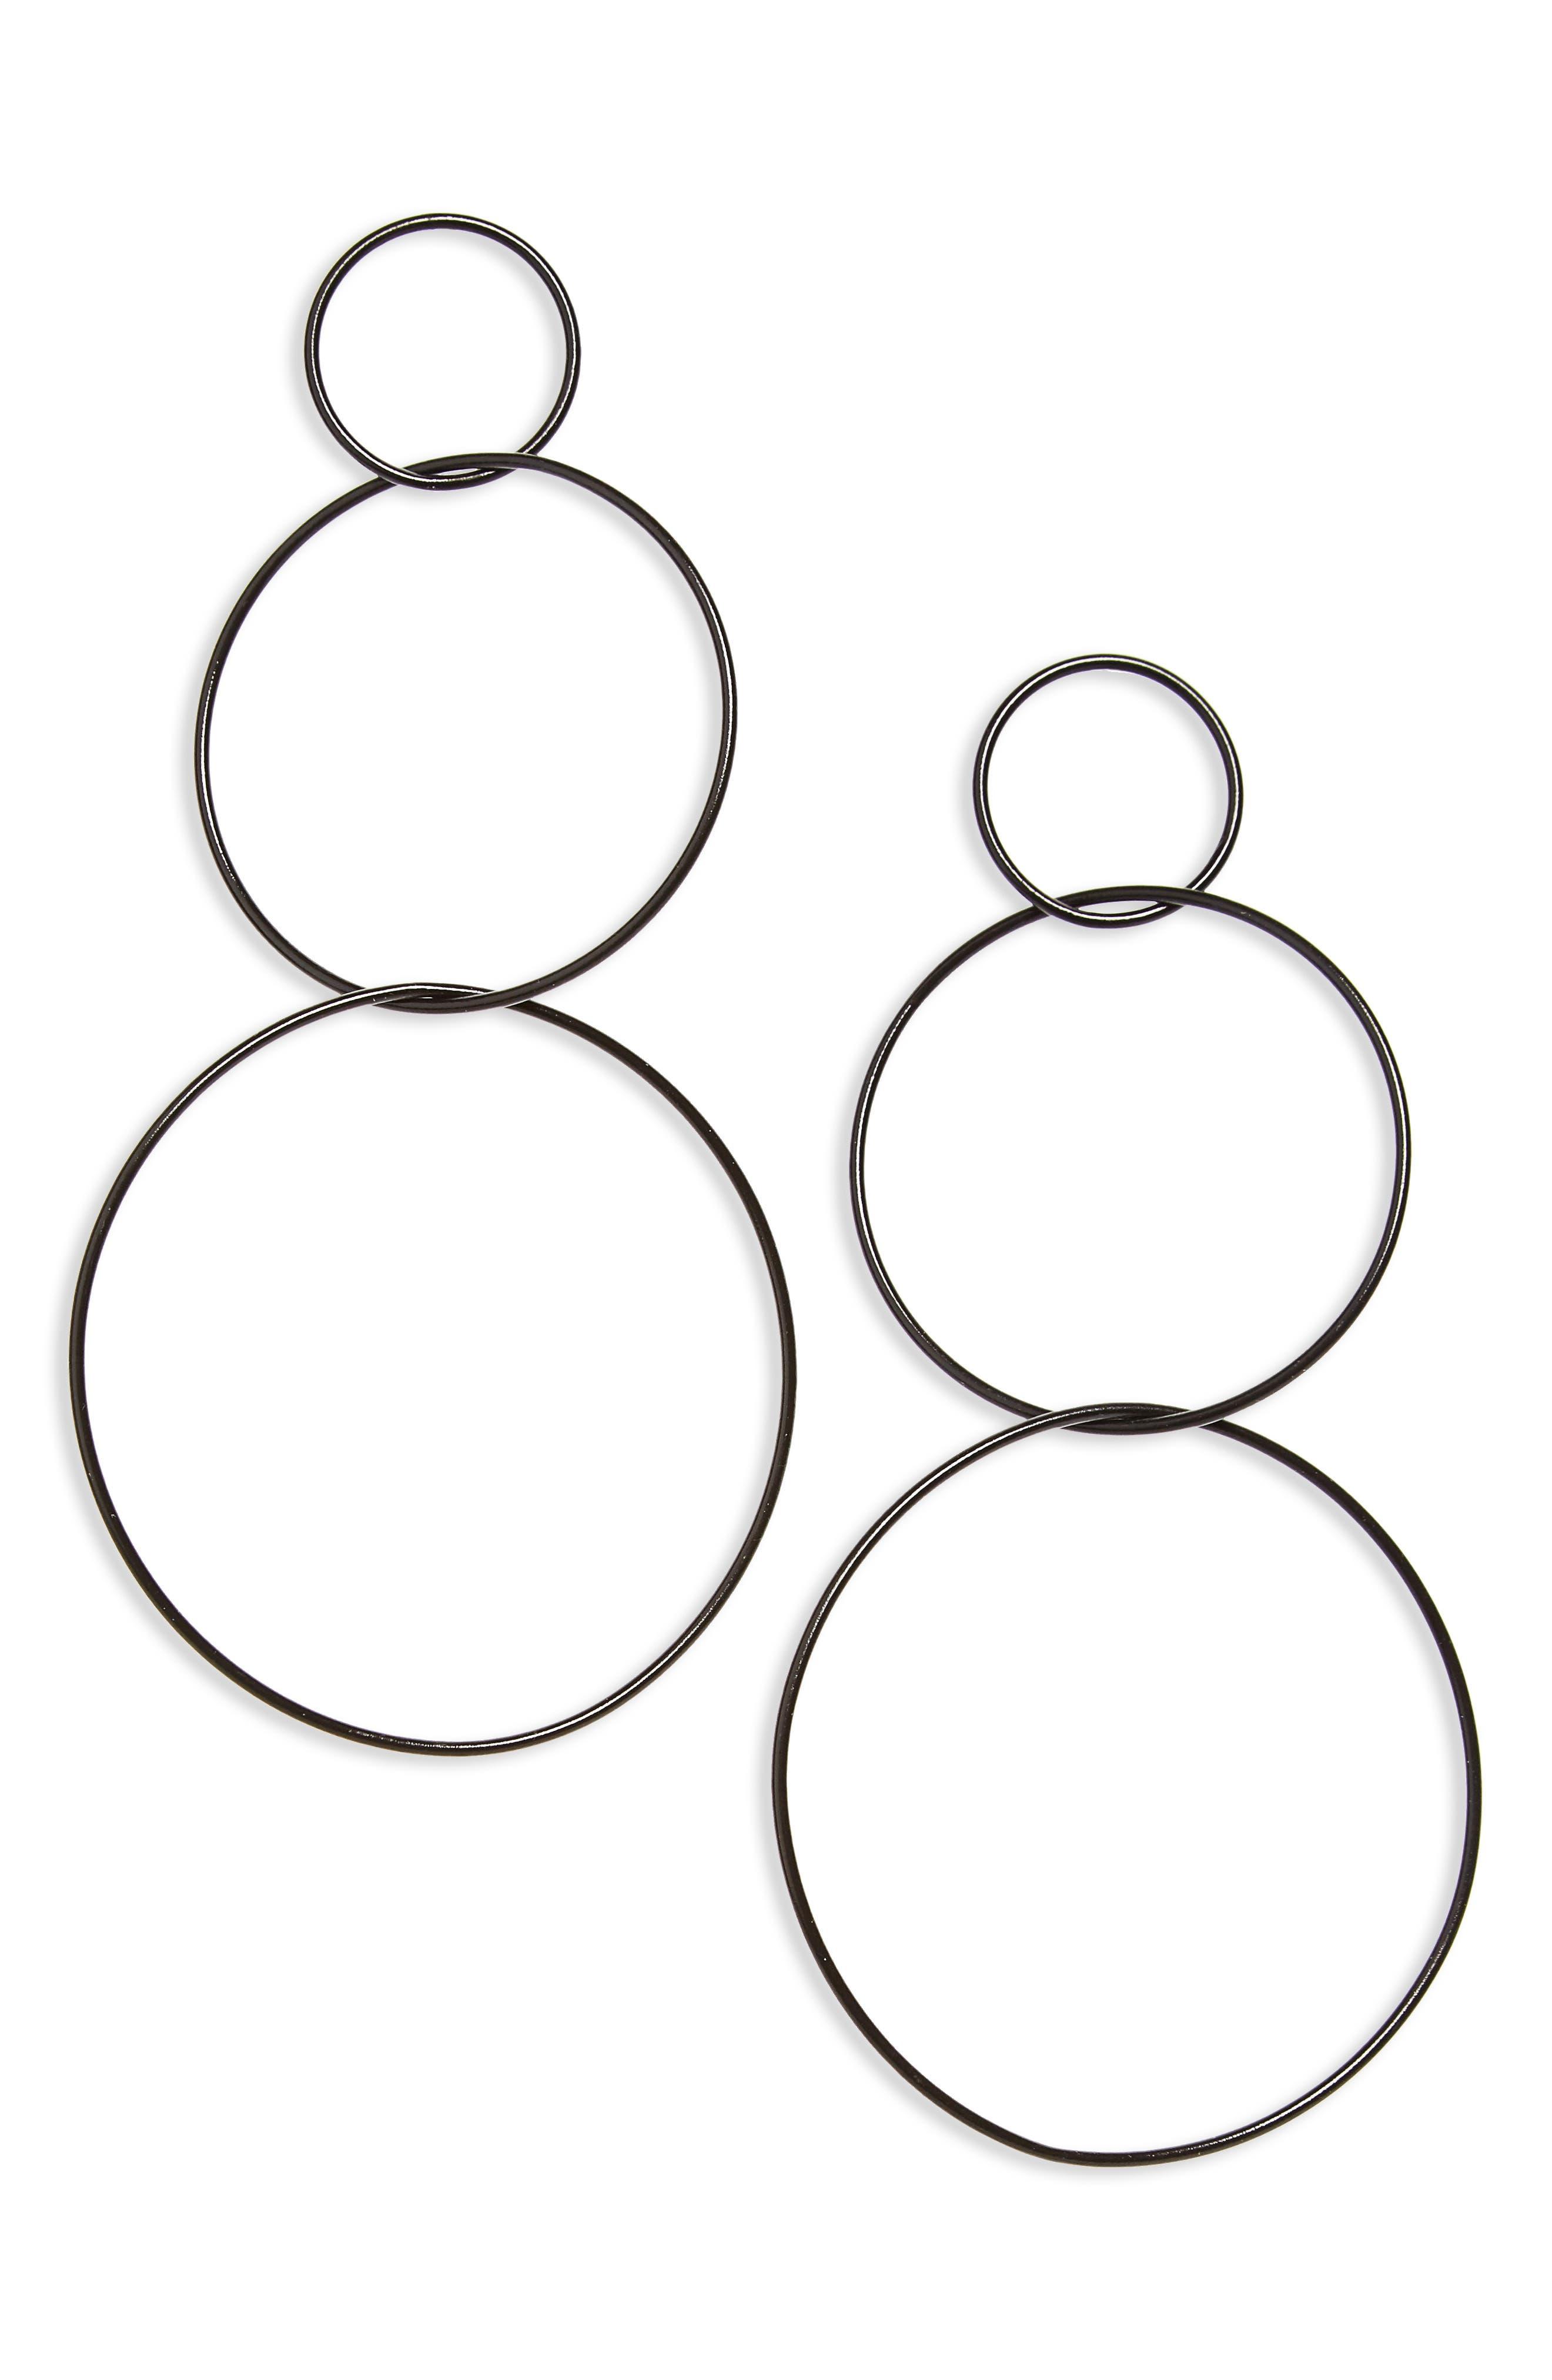 Isabel Marant Floyd Circle Earrings